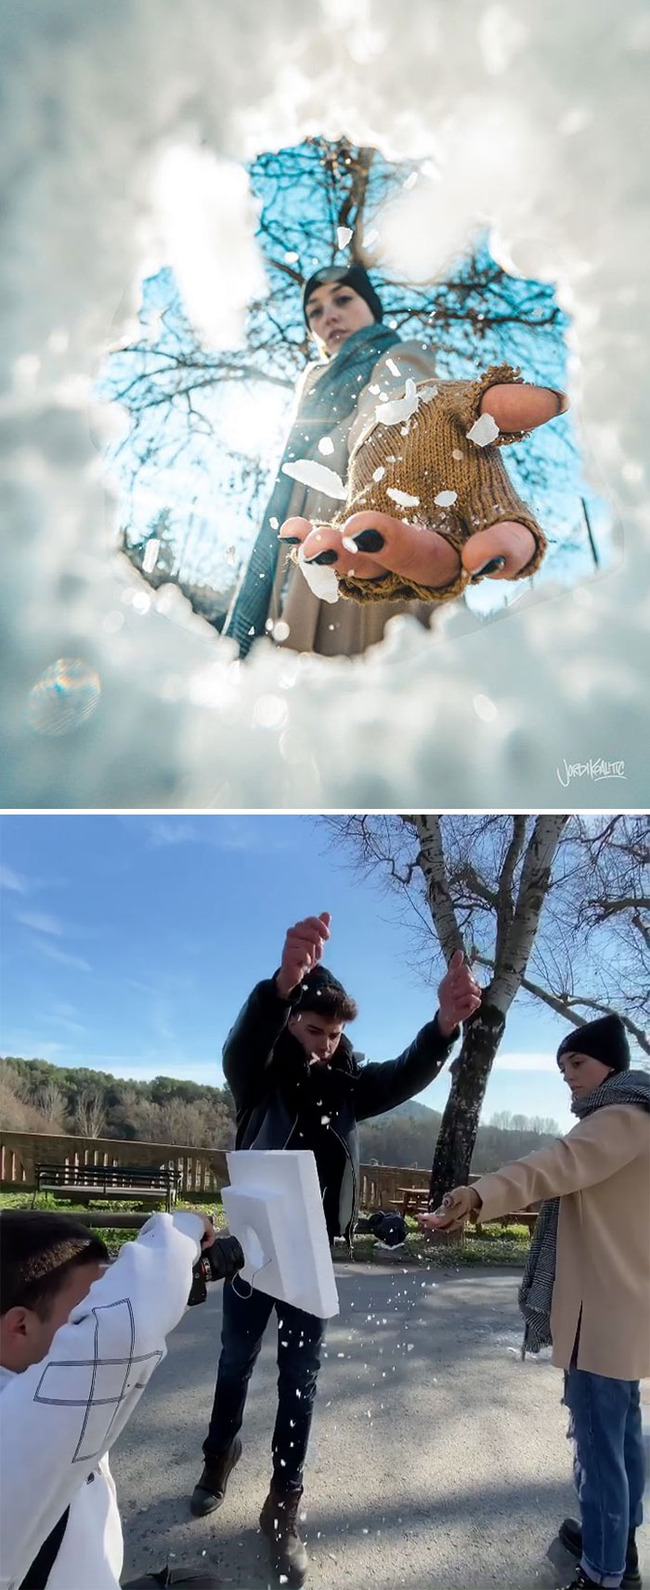 photography-tricks-jordi-koalitic-5f6b151b61655__700